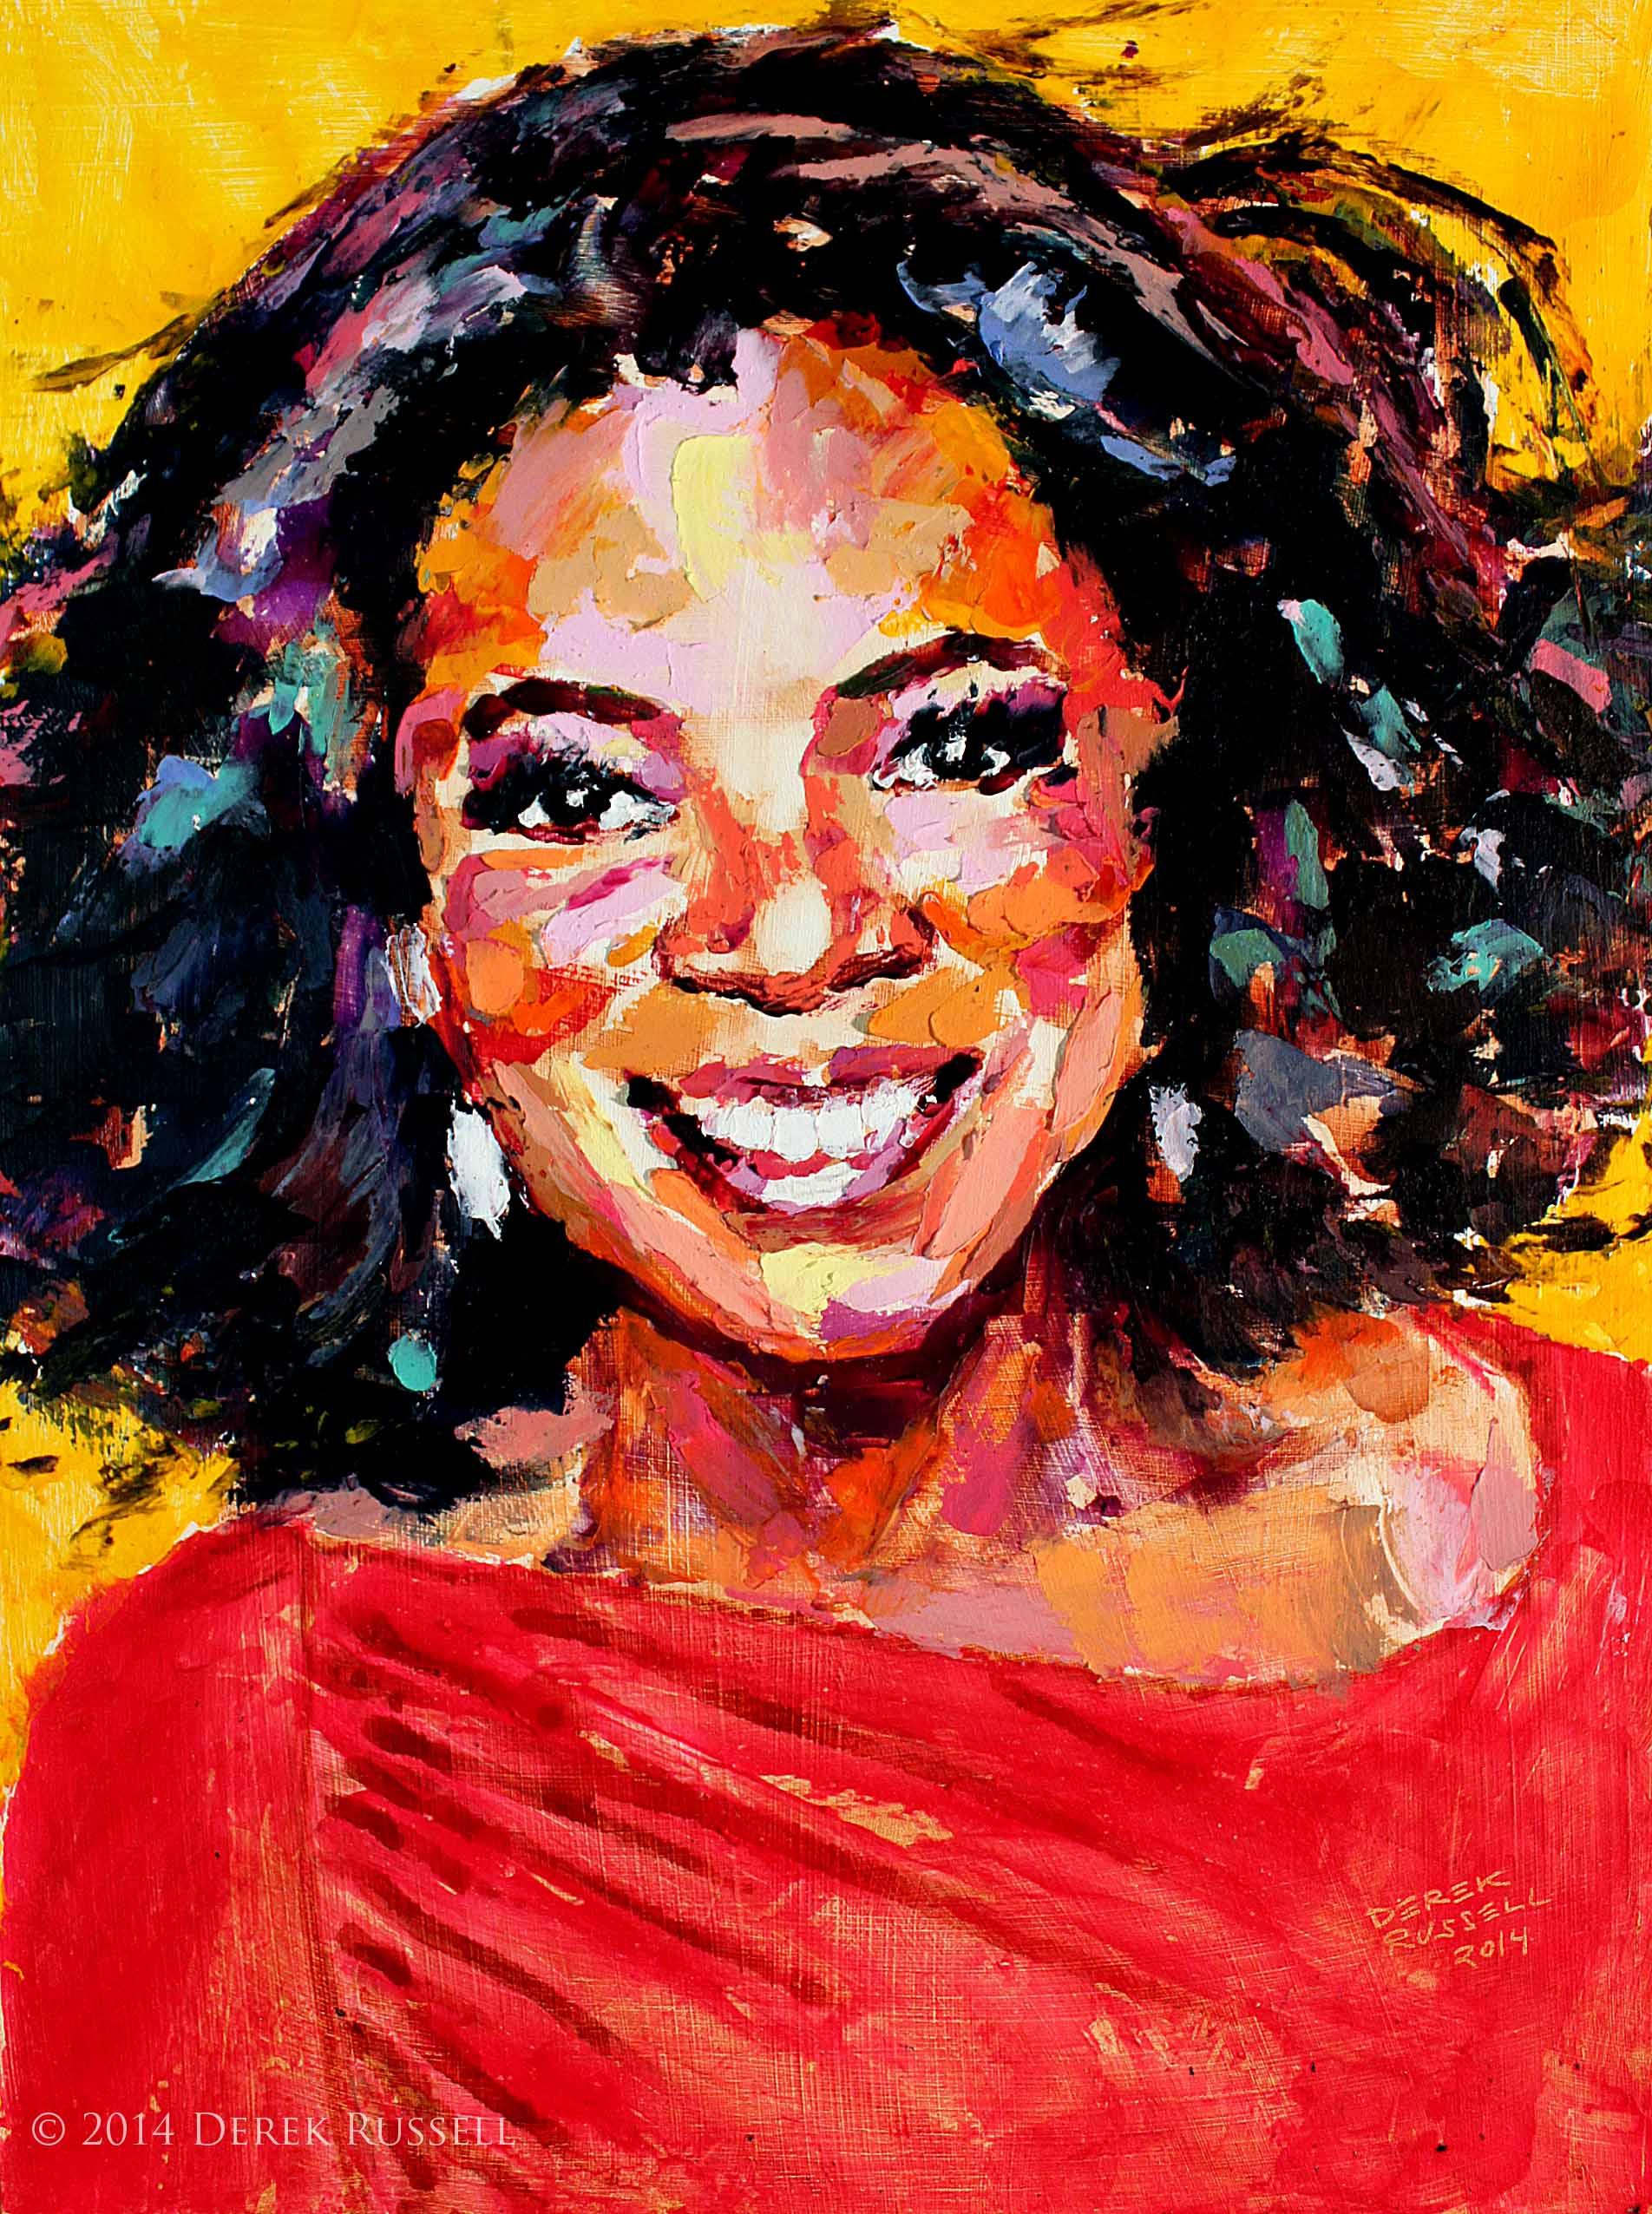 Oprah Winfrey Original Portrait Pop Art Painting by Derek Russell